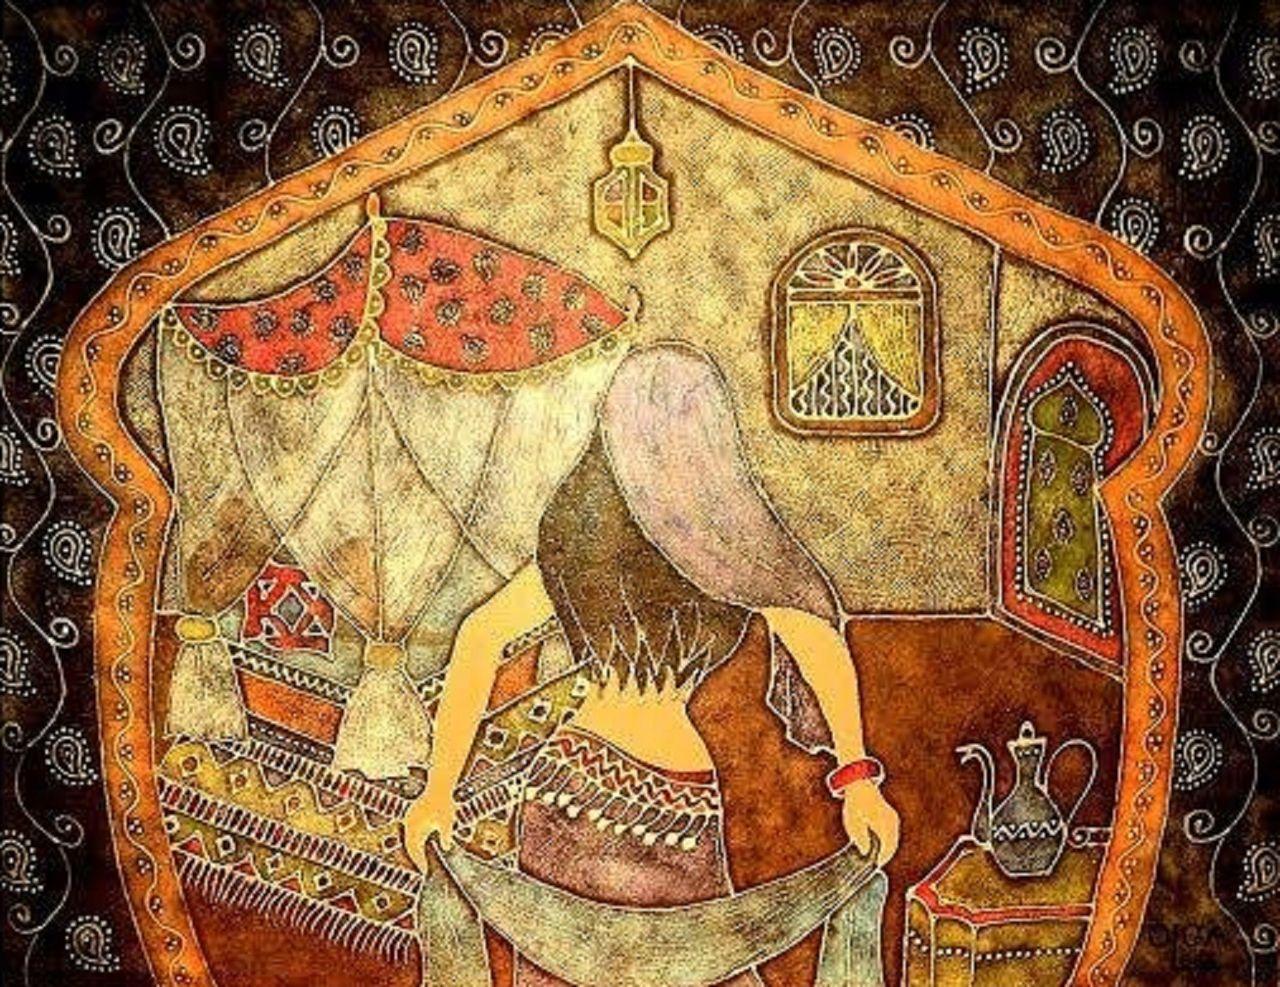 Olga  Leila Mille et une nuits